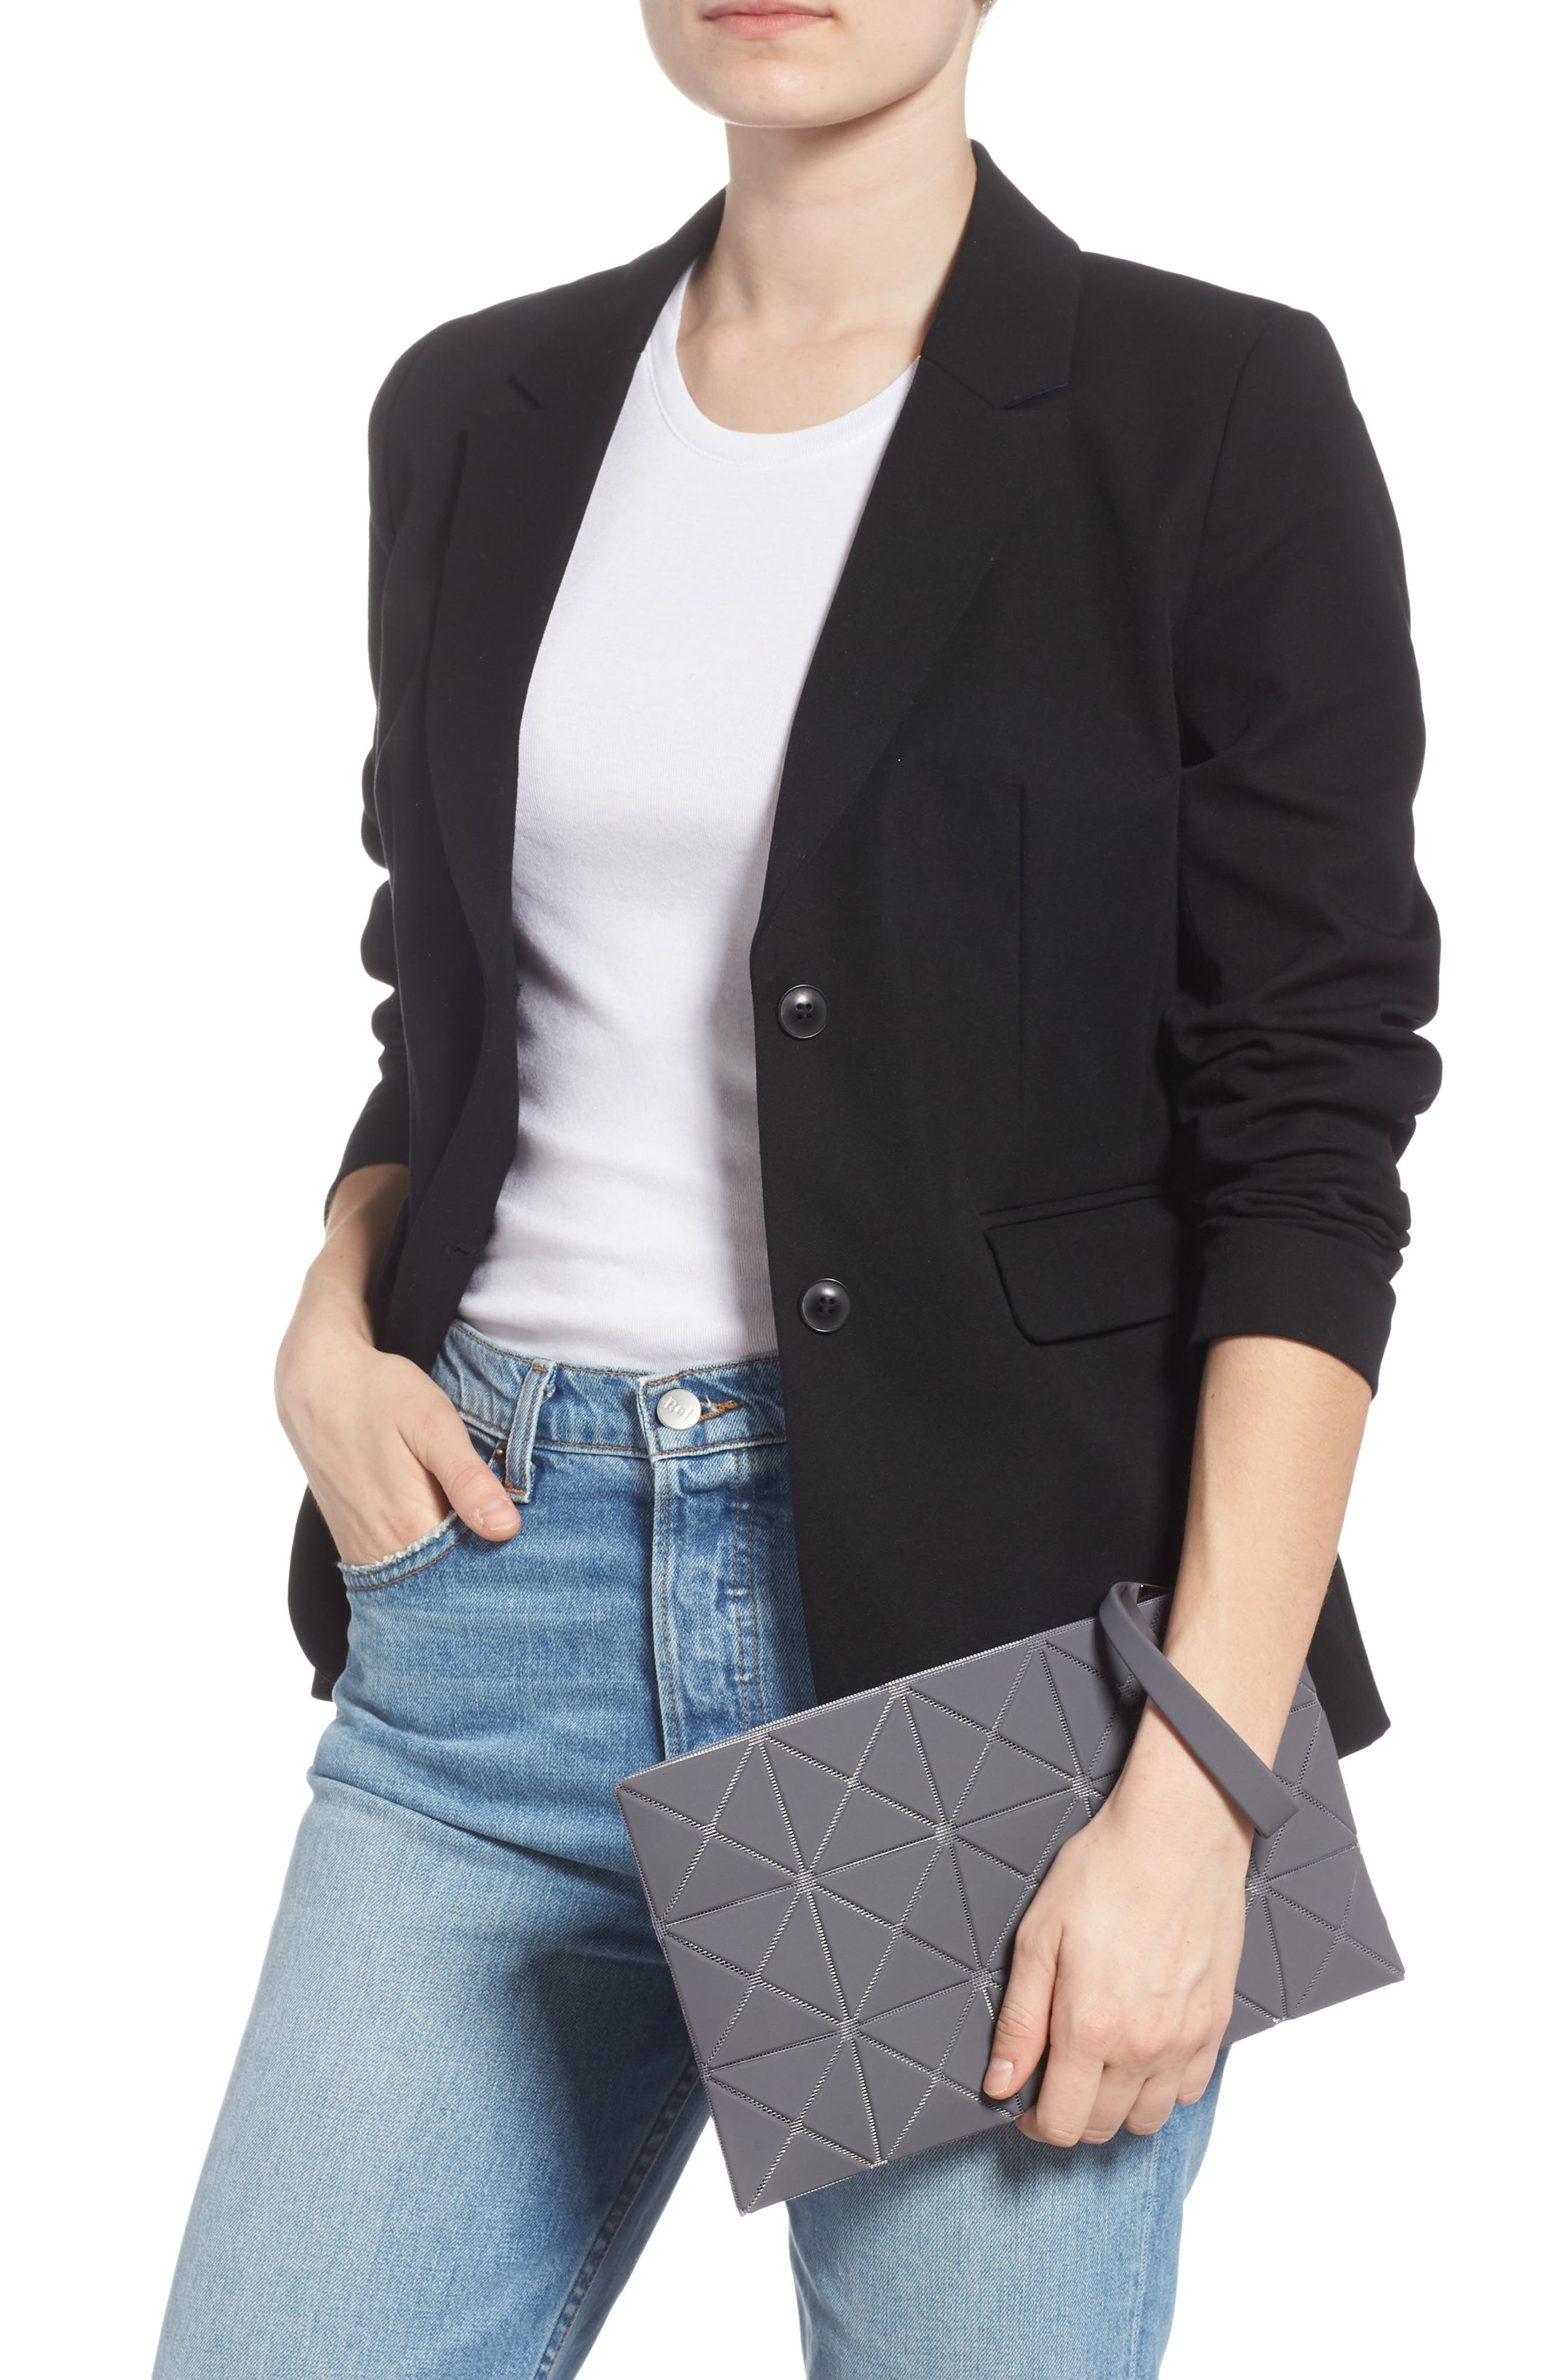 Lucent Faux Leather Wristlet,                         Main,                         color, GRAY